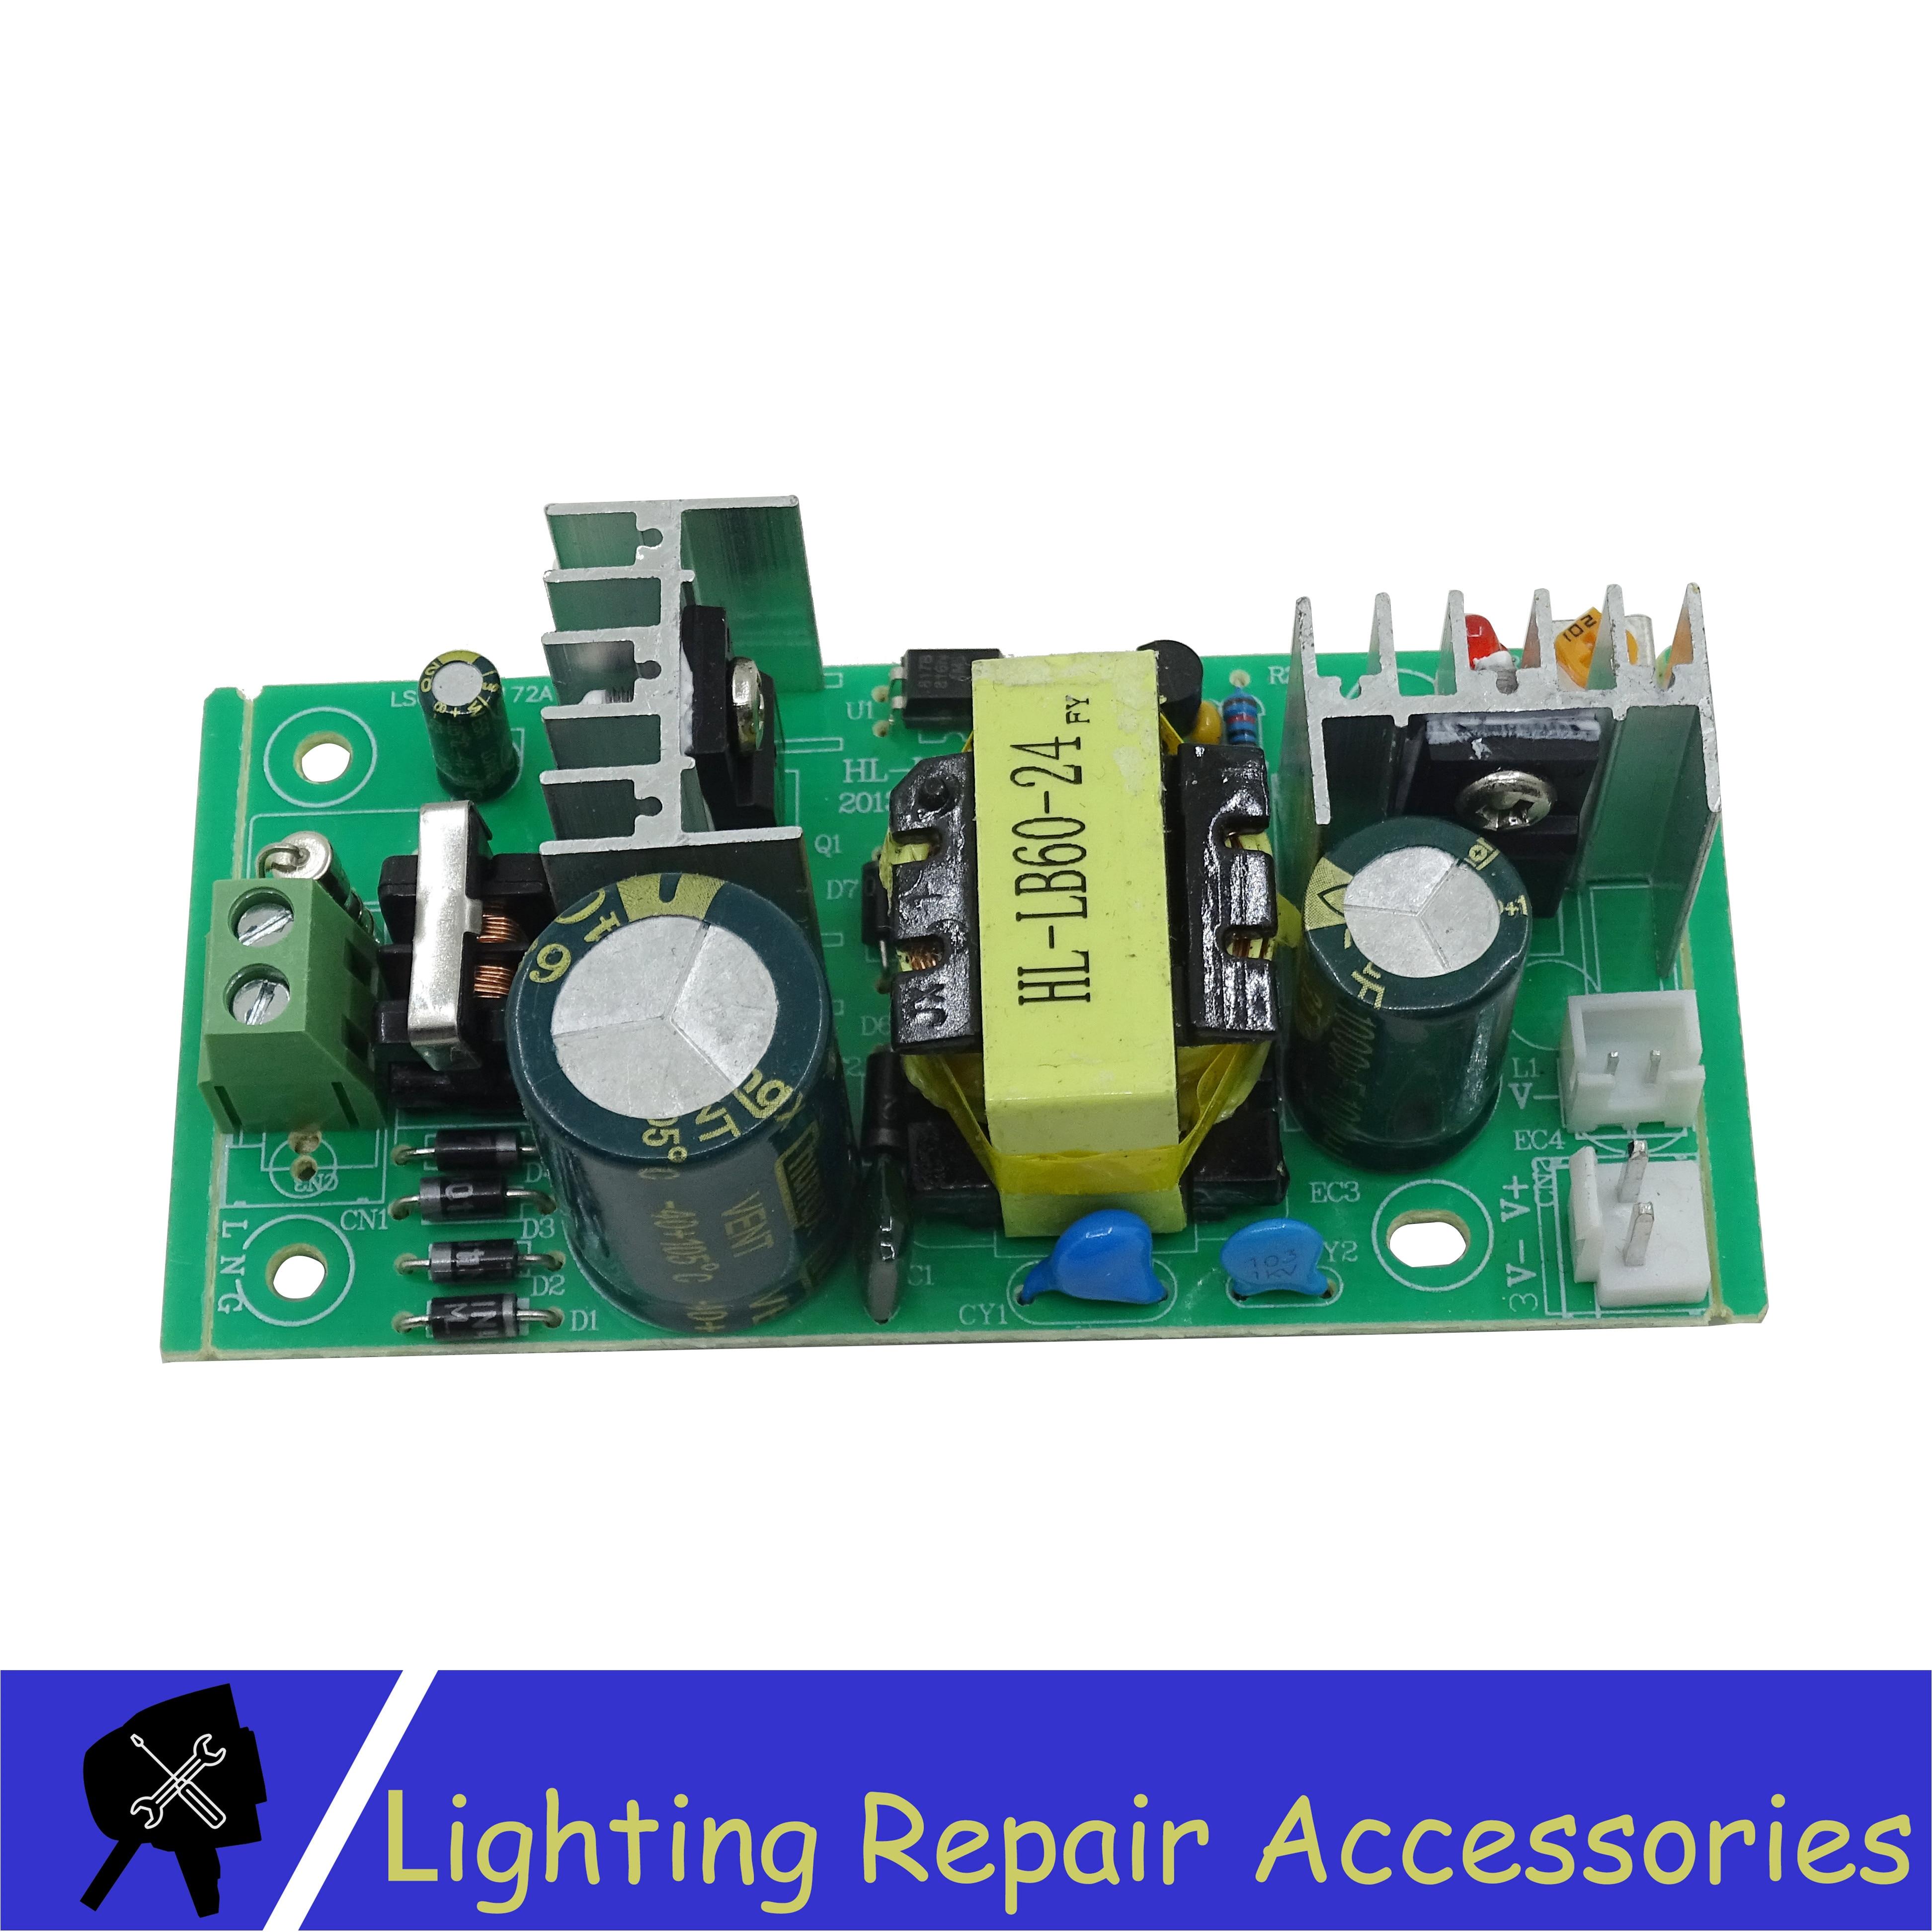 60w 24V 2.5A Power Supply Stage Light Accessories For 12x12w 54x1w RGBW Plastic Led par light